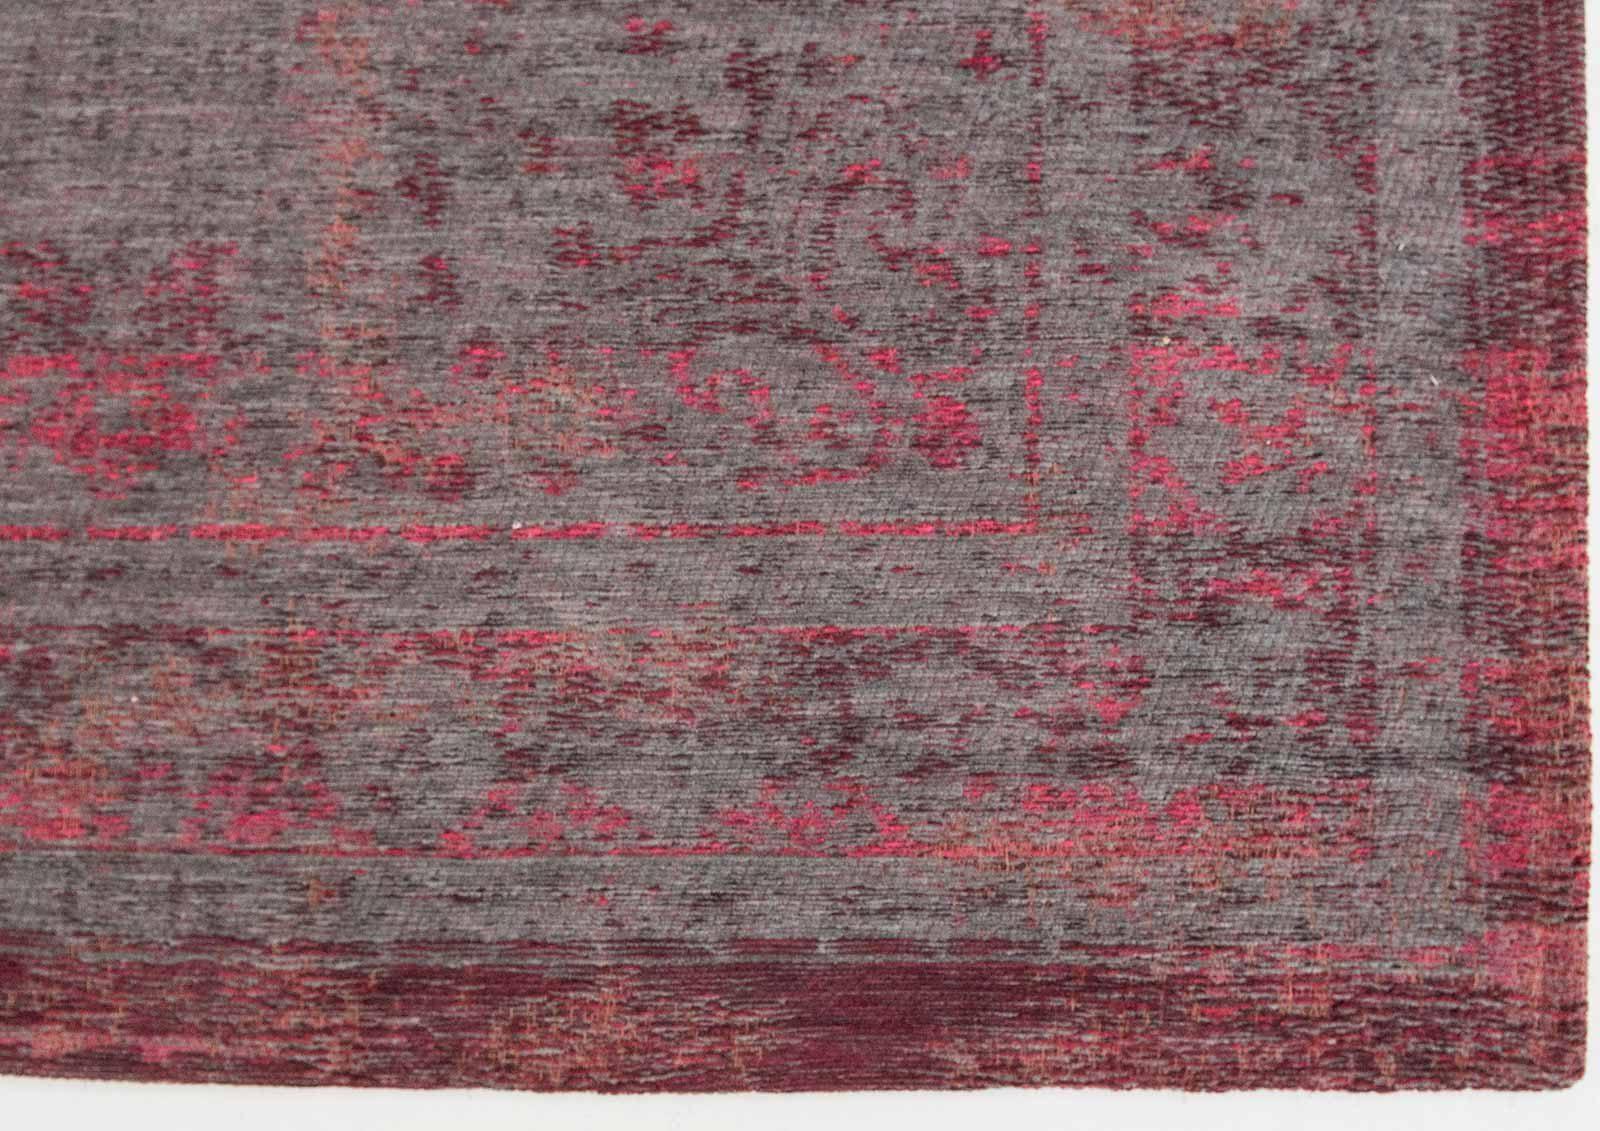 rug Louis De Poortere LX8261 Fading World Medaillon Pink Flash corner